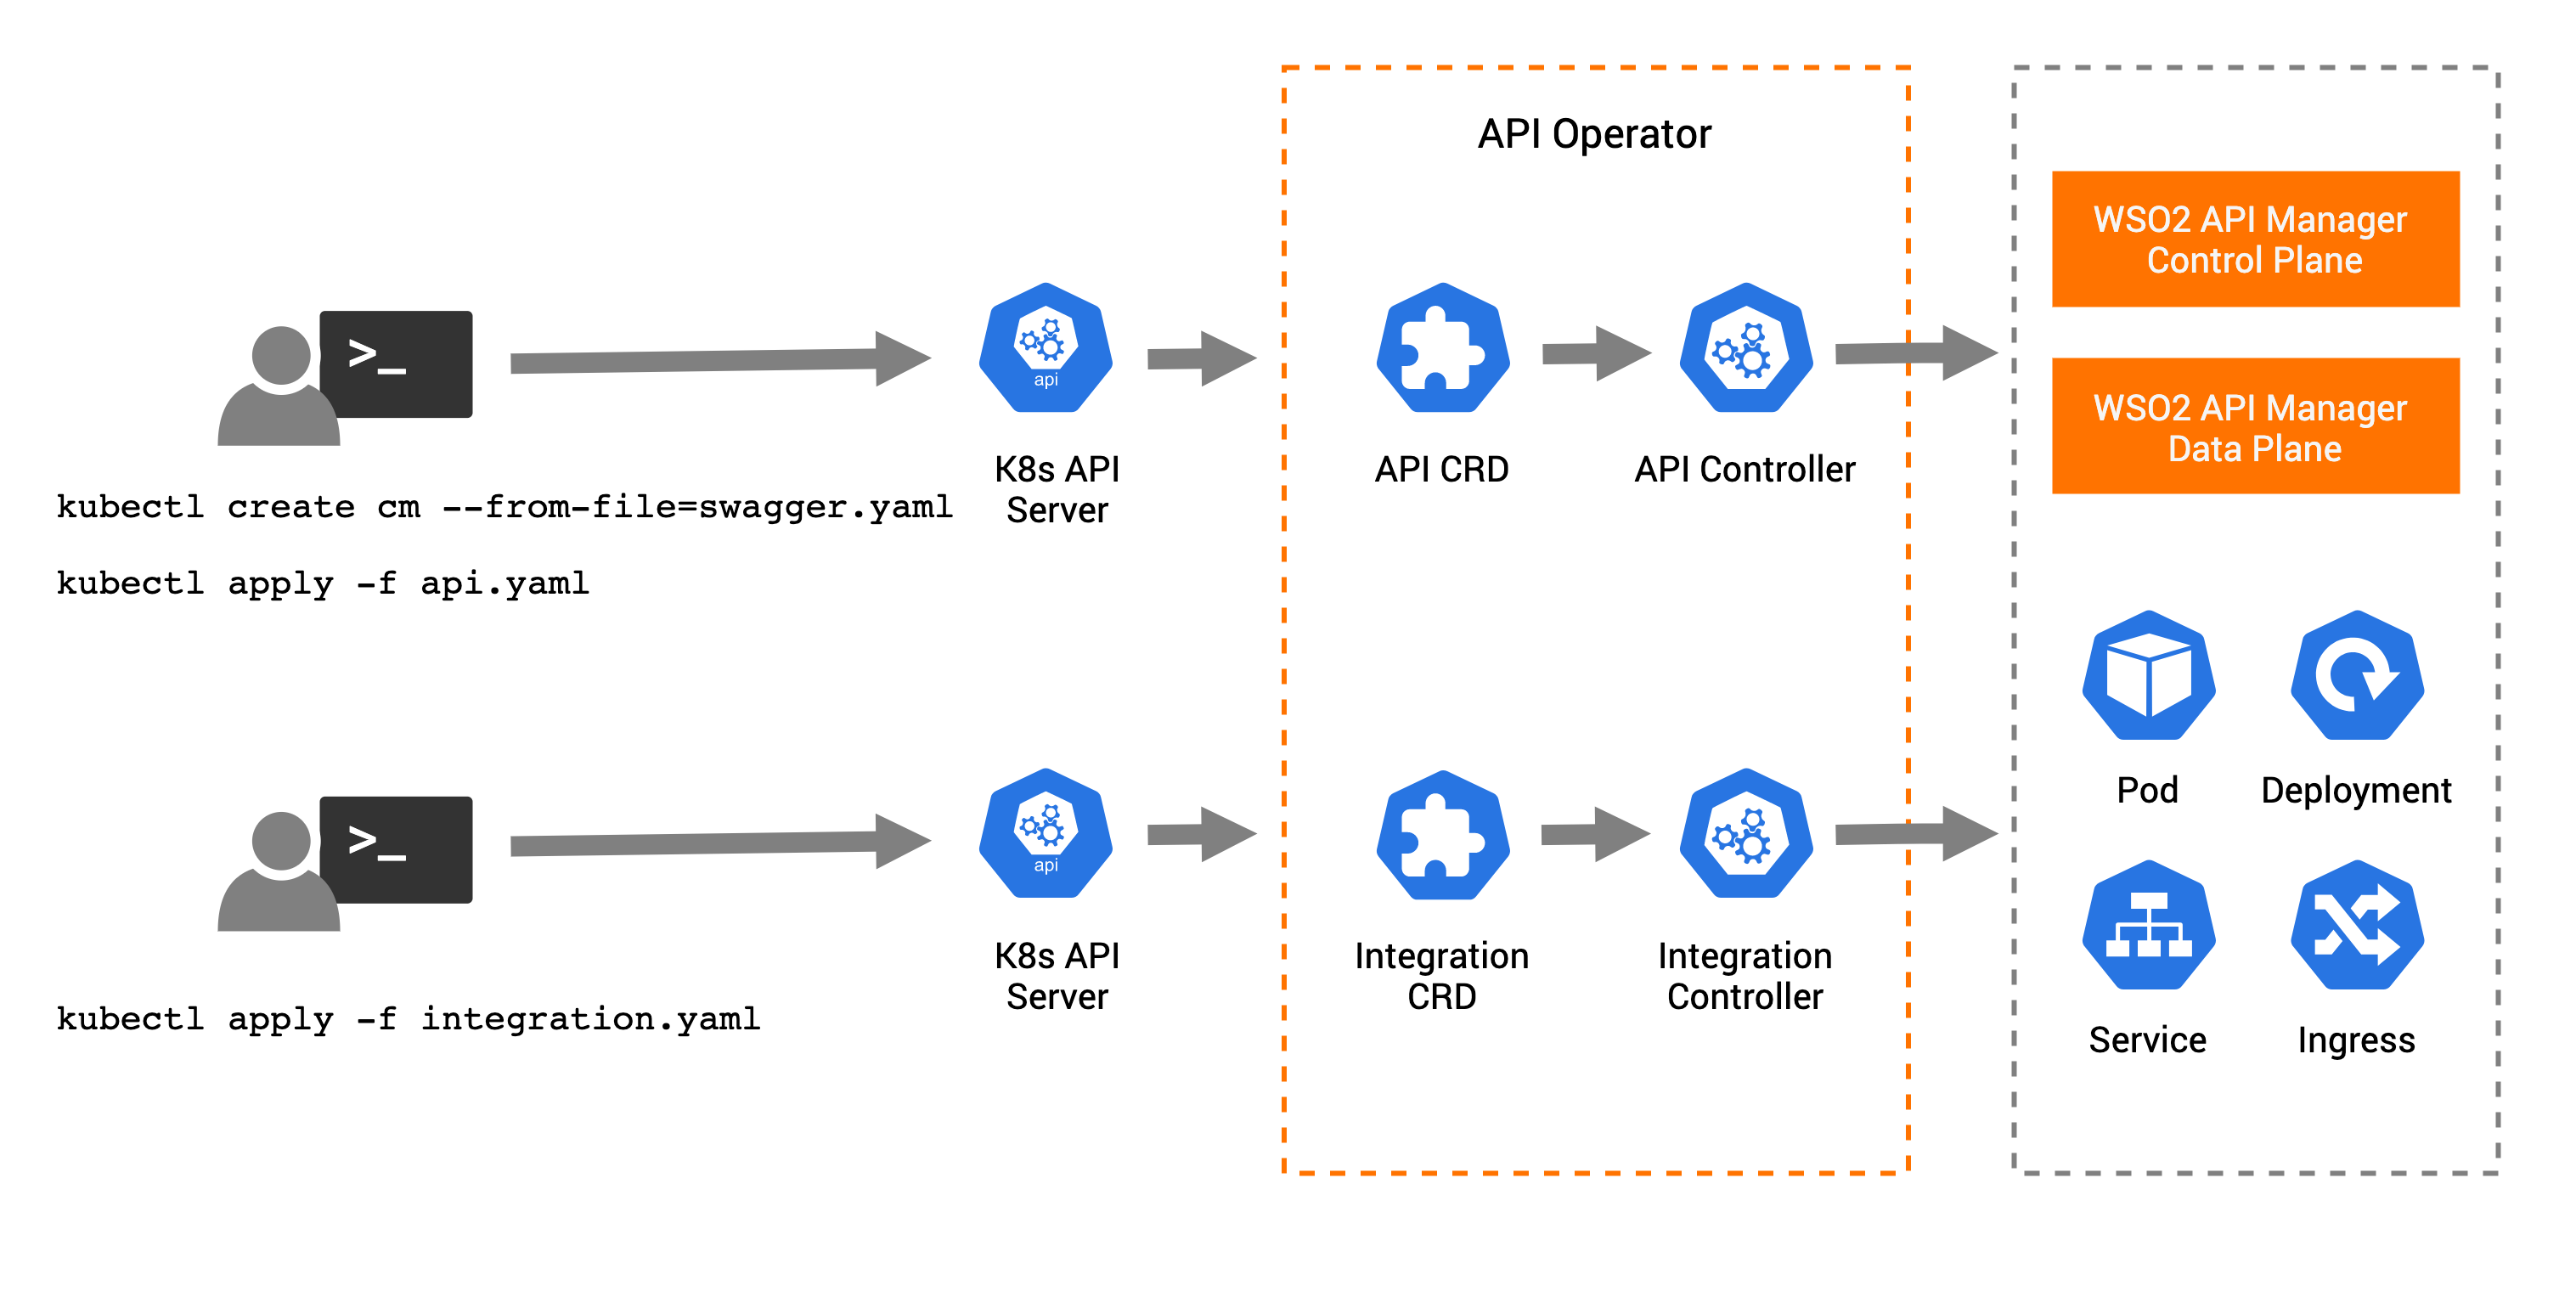 How API Operator Works